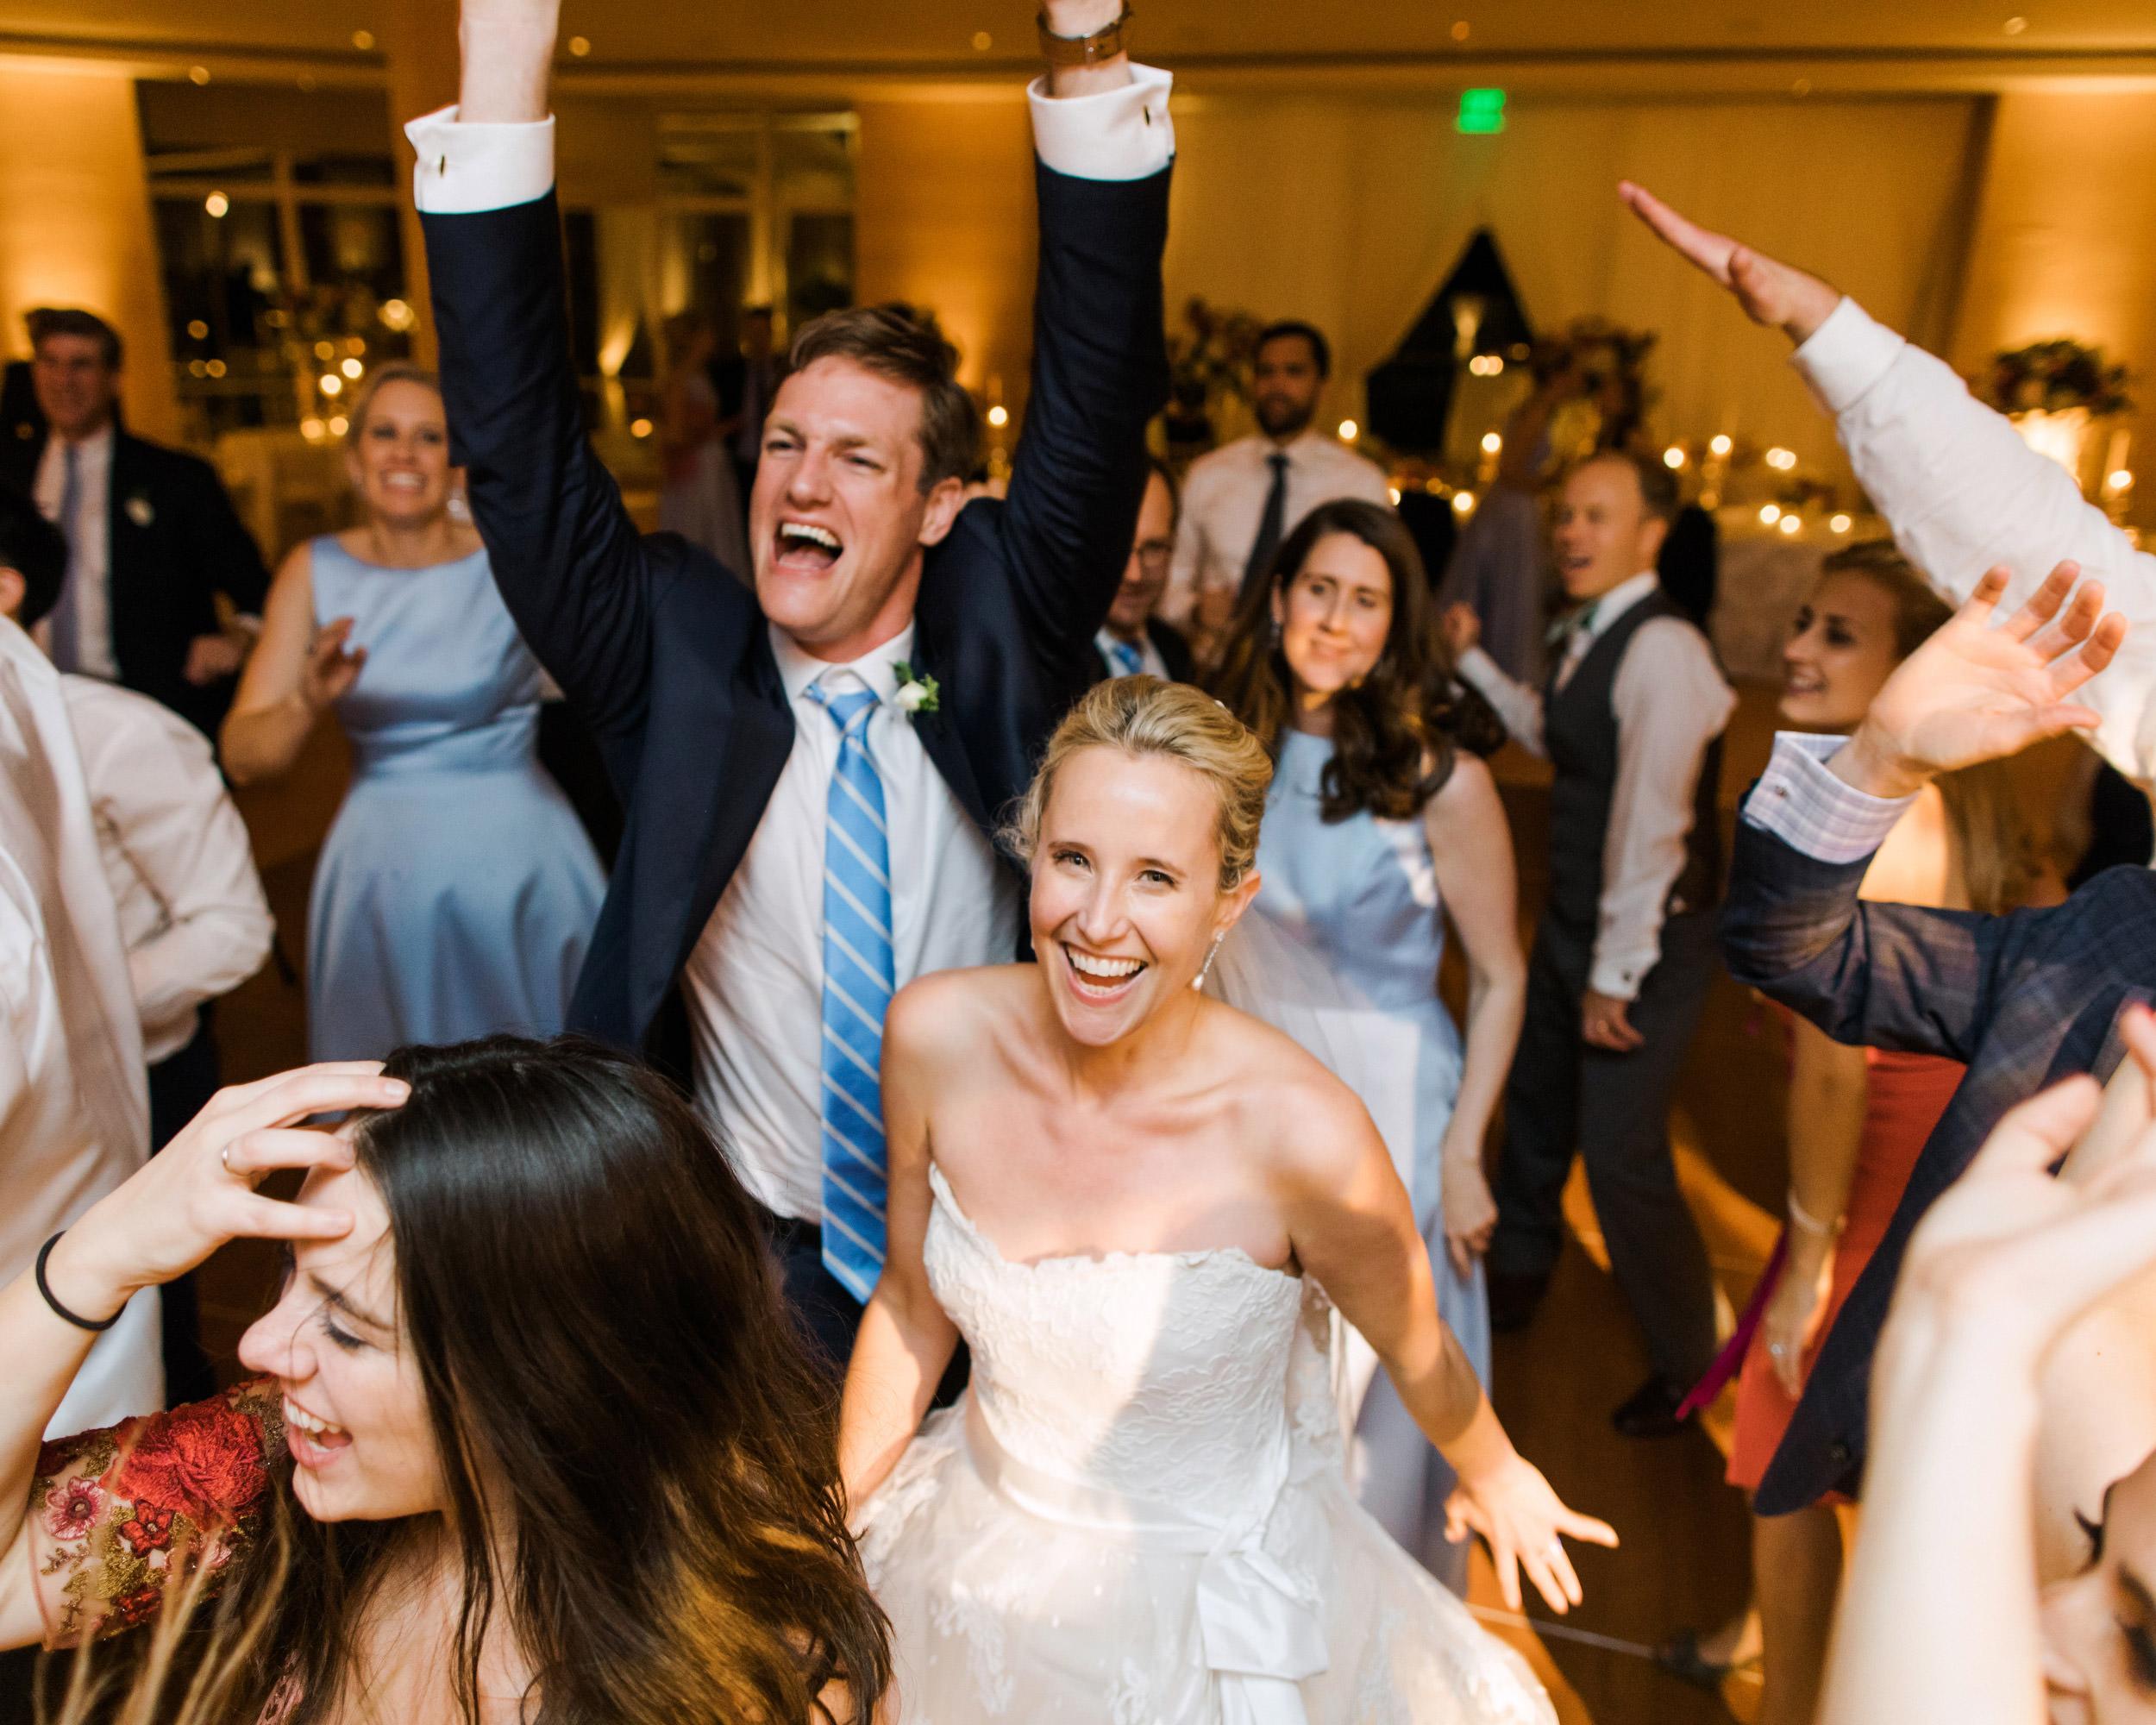 biltmore_santa_barbara_wedding_photos_coral_casino_096.jpg